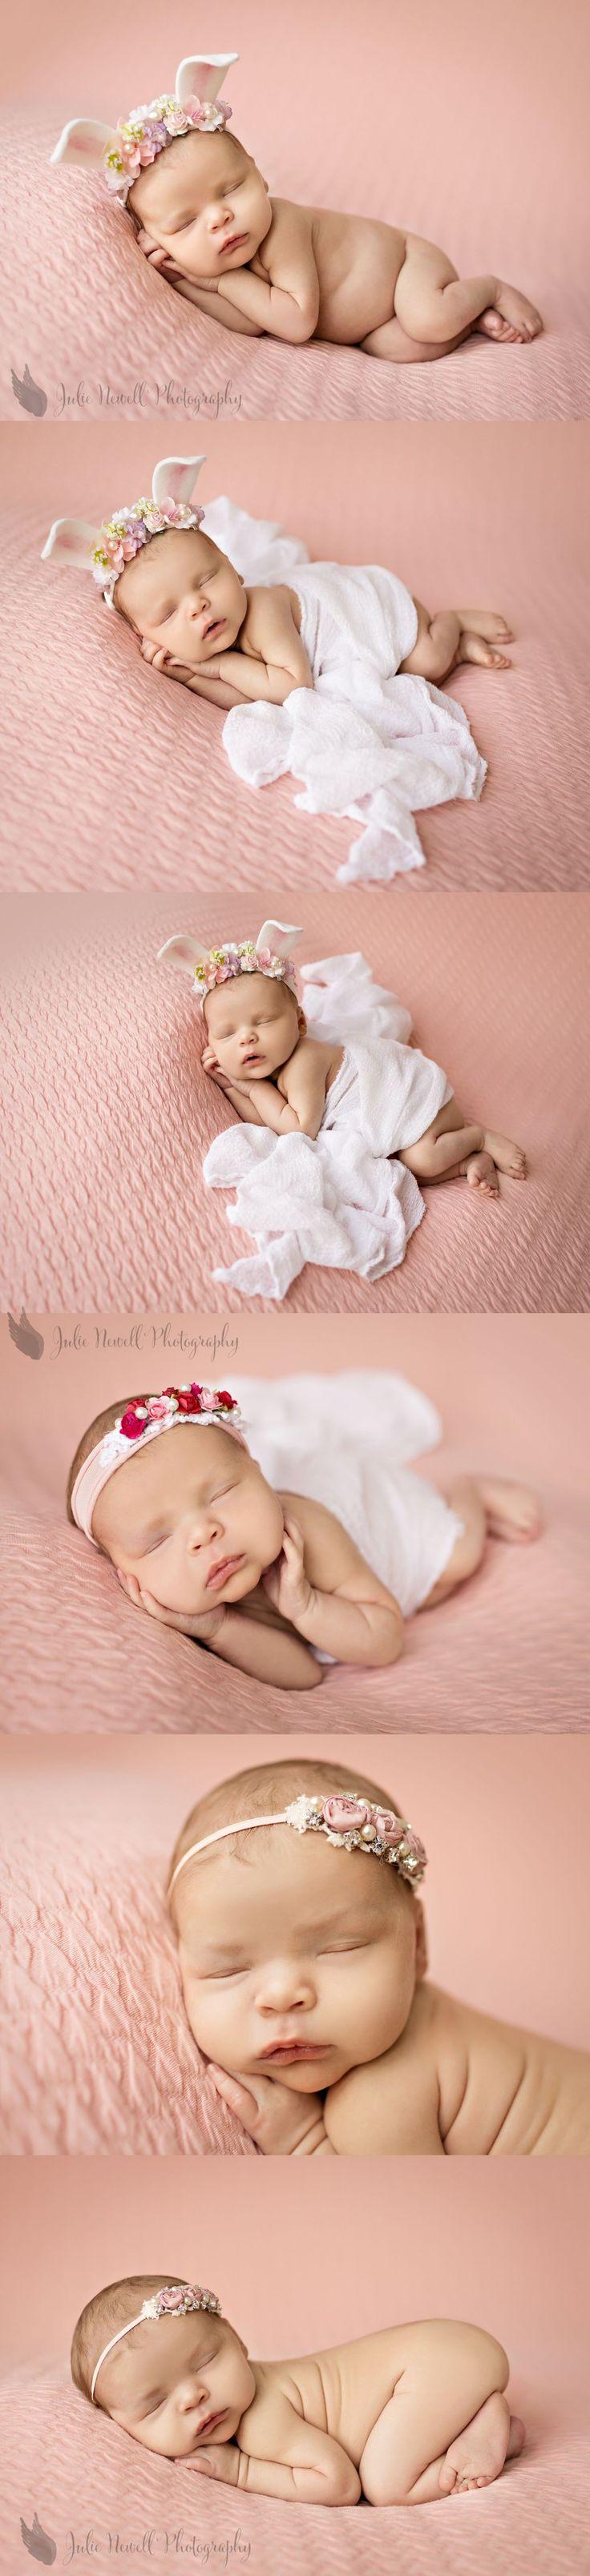 newborn photographer, newborn photography, chicago newborn photographer, chicago newborn photography, best newborn photographer, best newborn photography, newborn girl photographer, newborn girl photography, newborn bunny, bunny ears, spring newborn